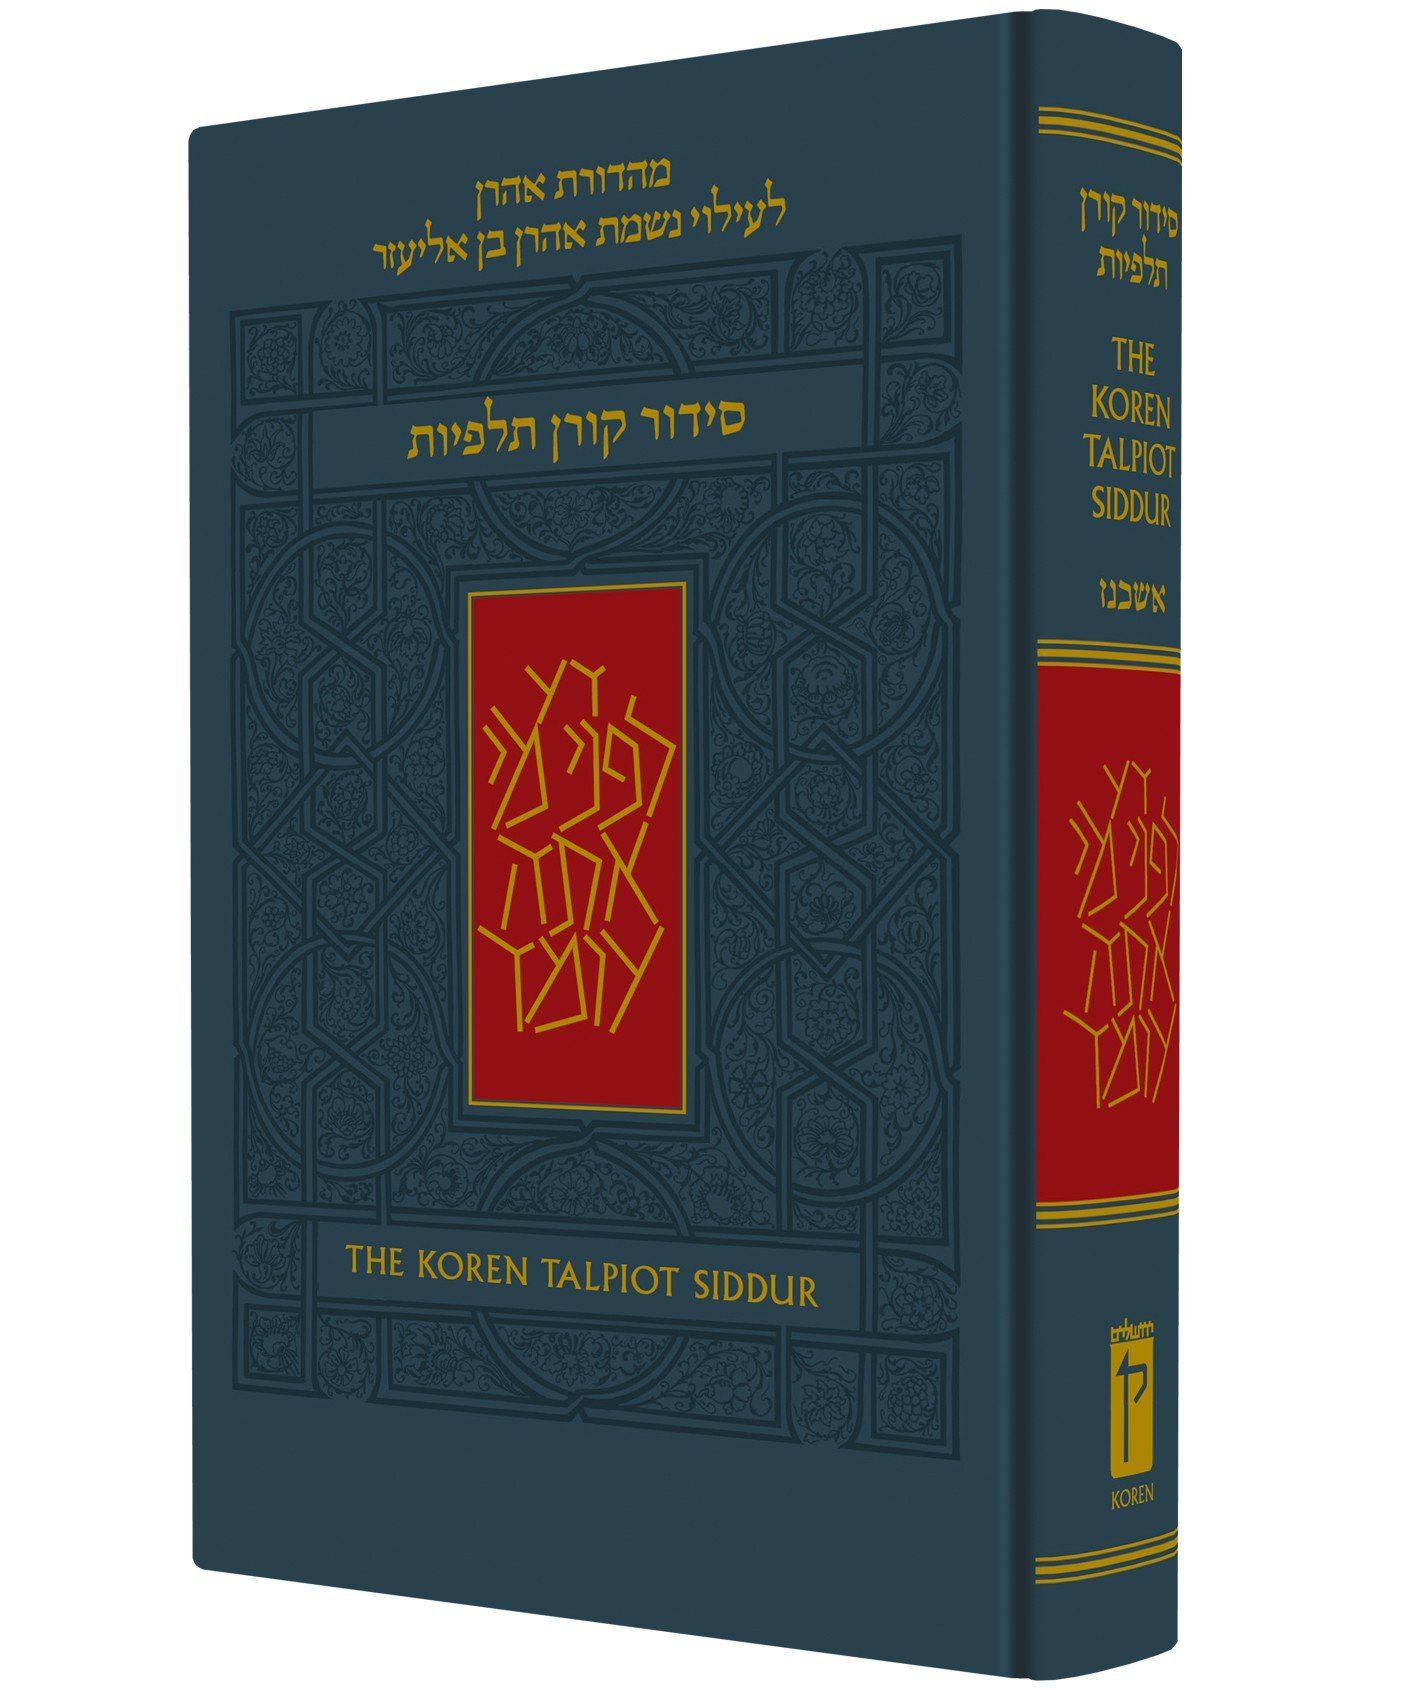 Koren Talpiot Siddur, Compact Size, Ashkenaz, English Instruction, HC (Hebrew Edition)